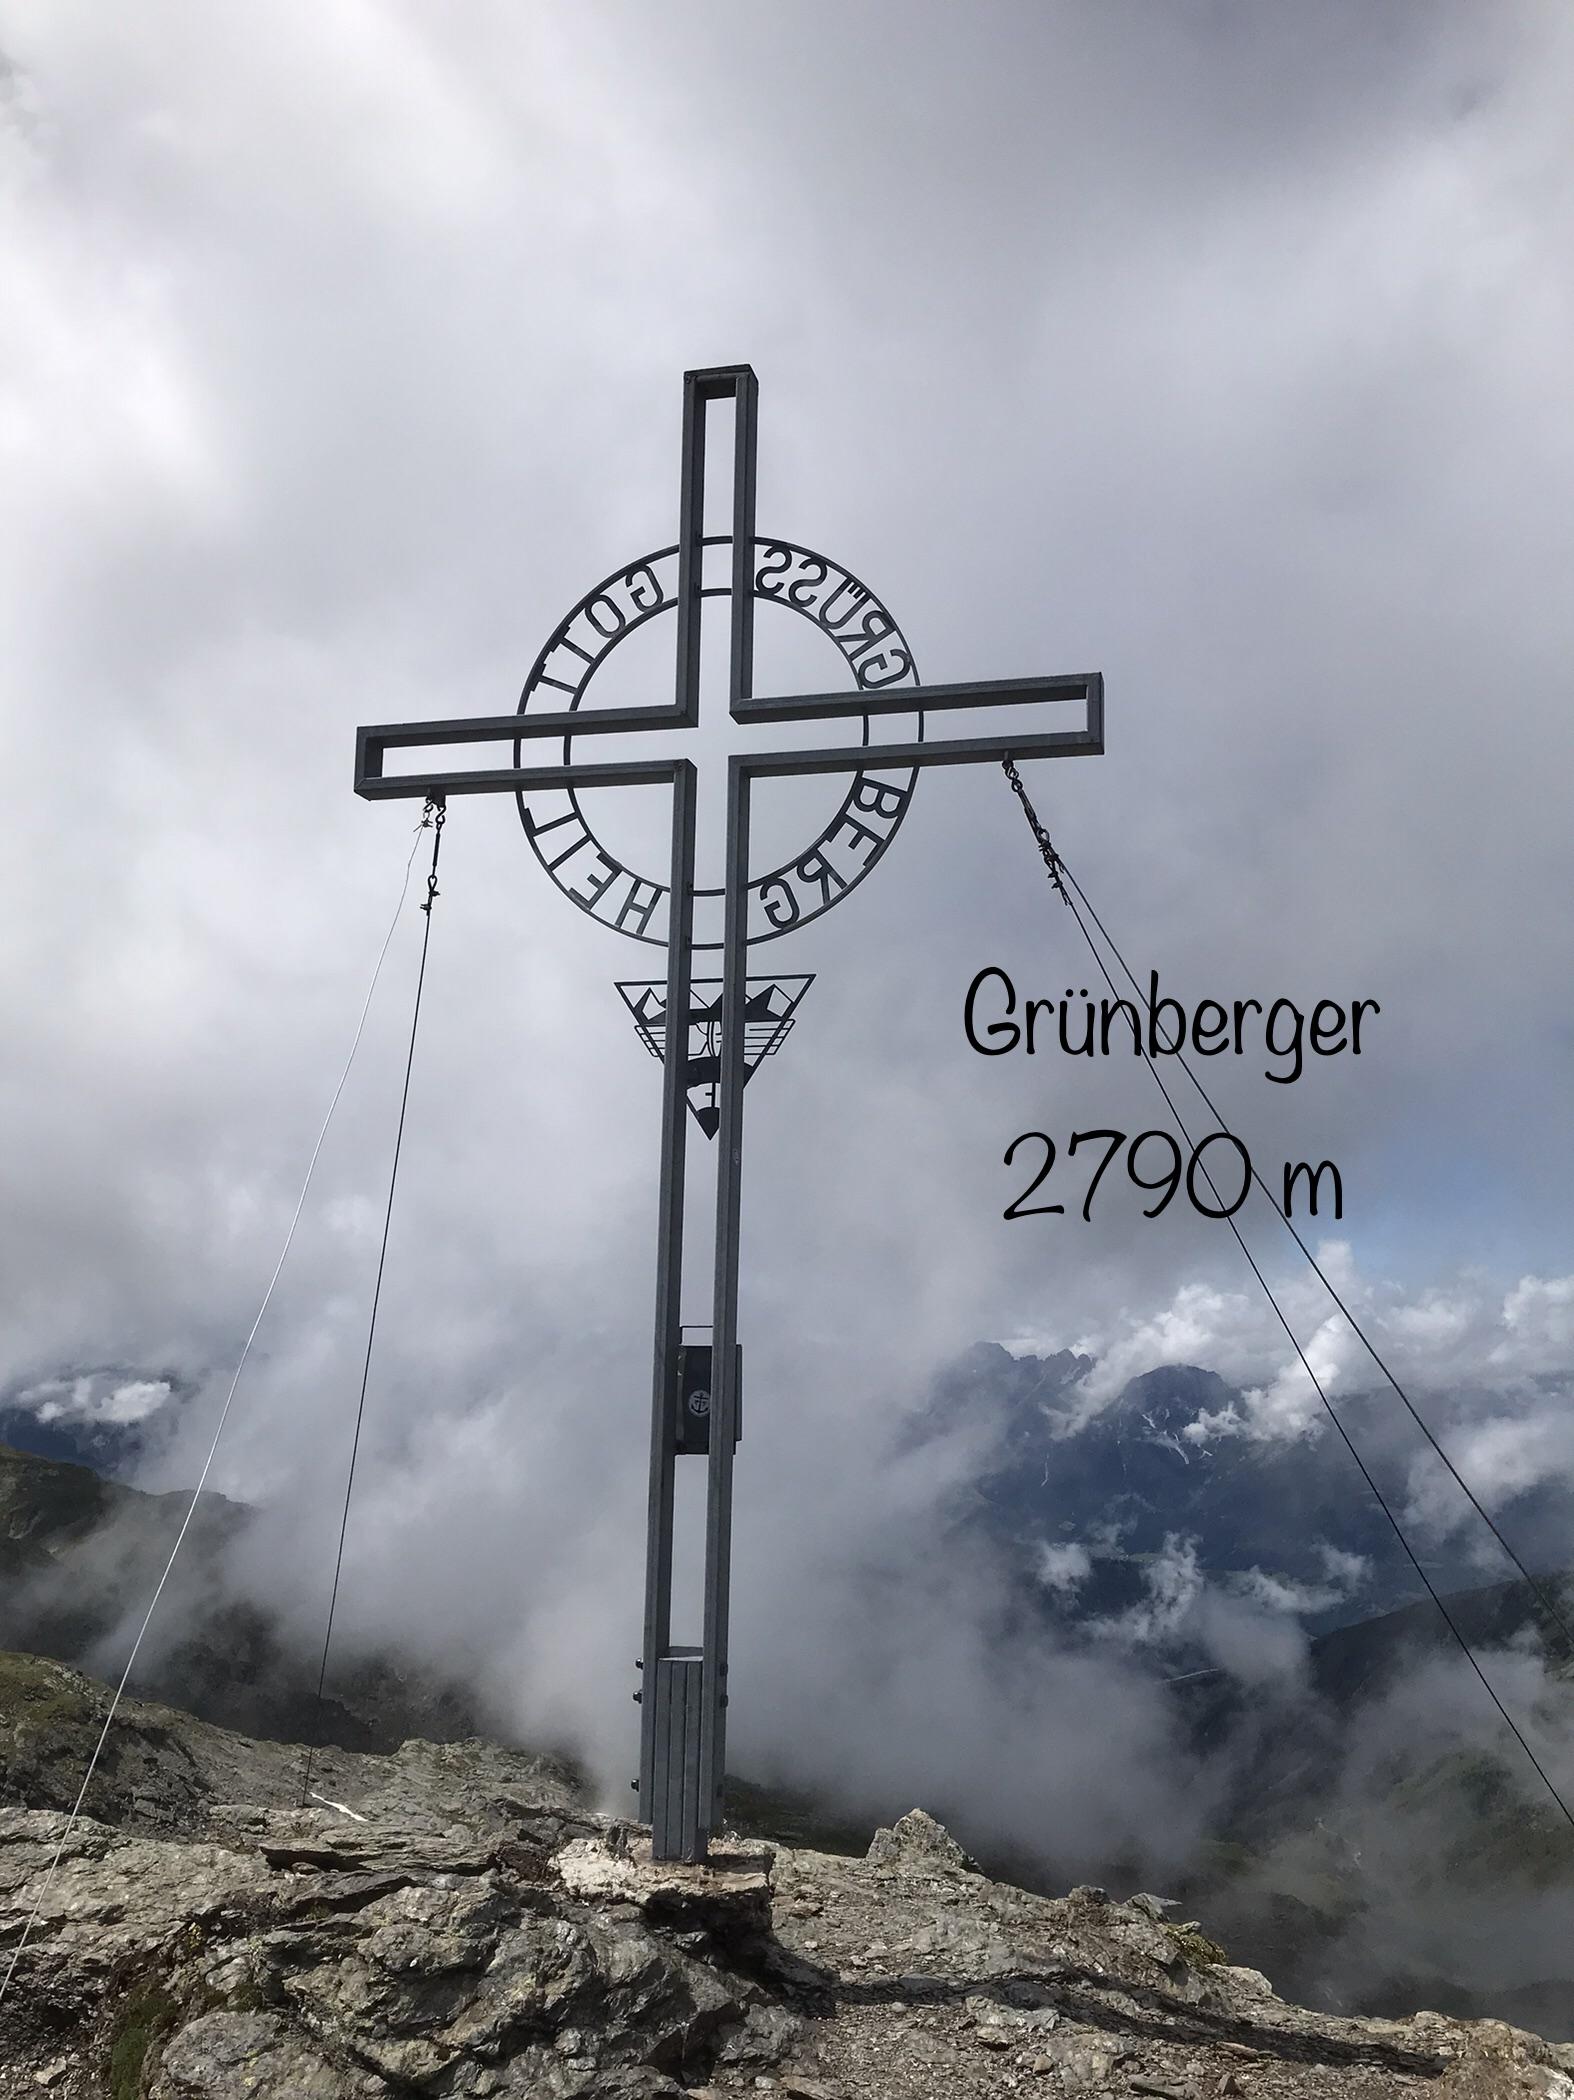 Grünbergspitze 2790m